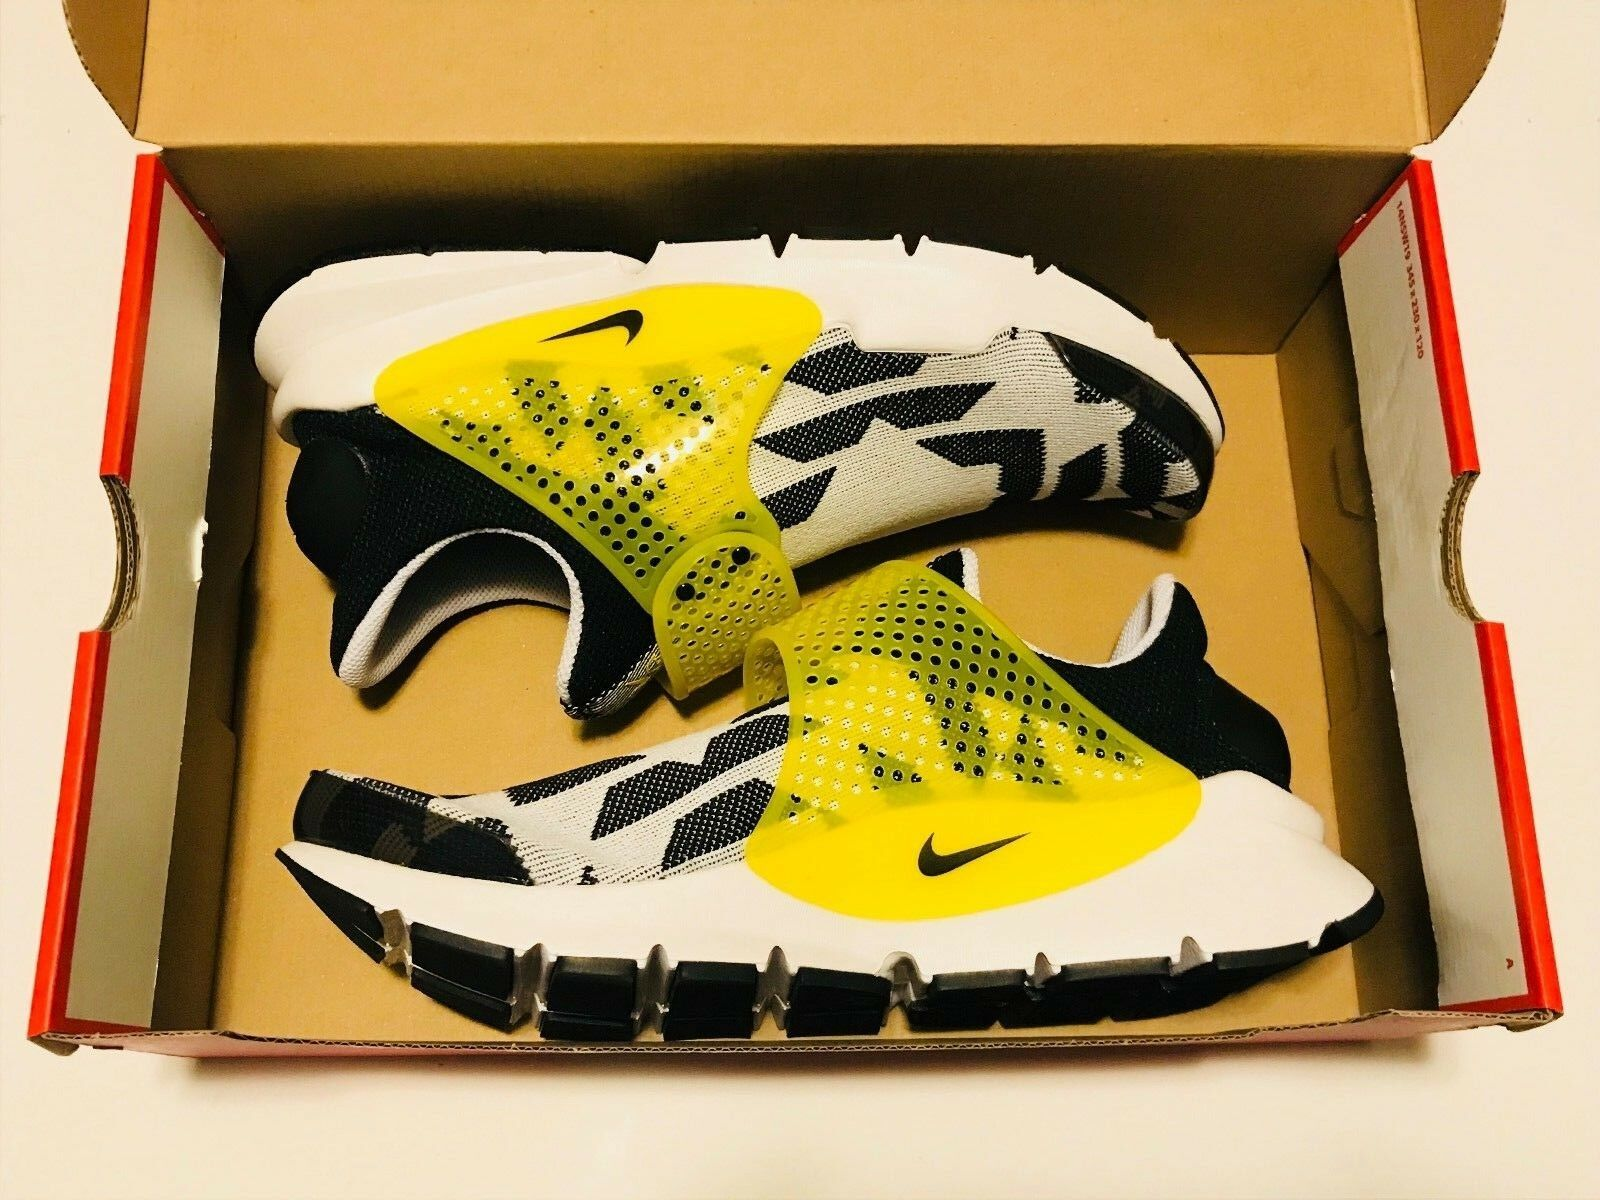 Nike calzino bianco nero del dardo gpx (mais 908660-117 uomo numero 10